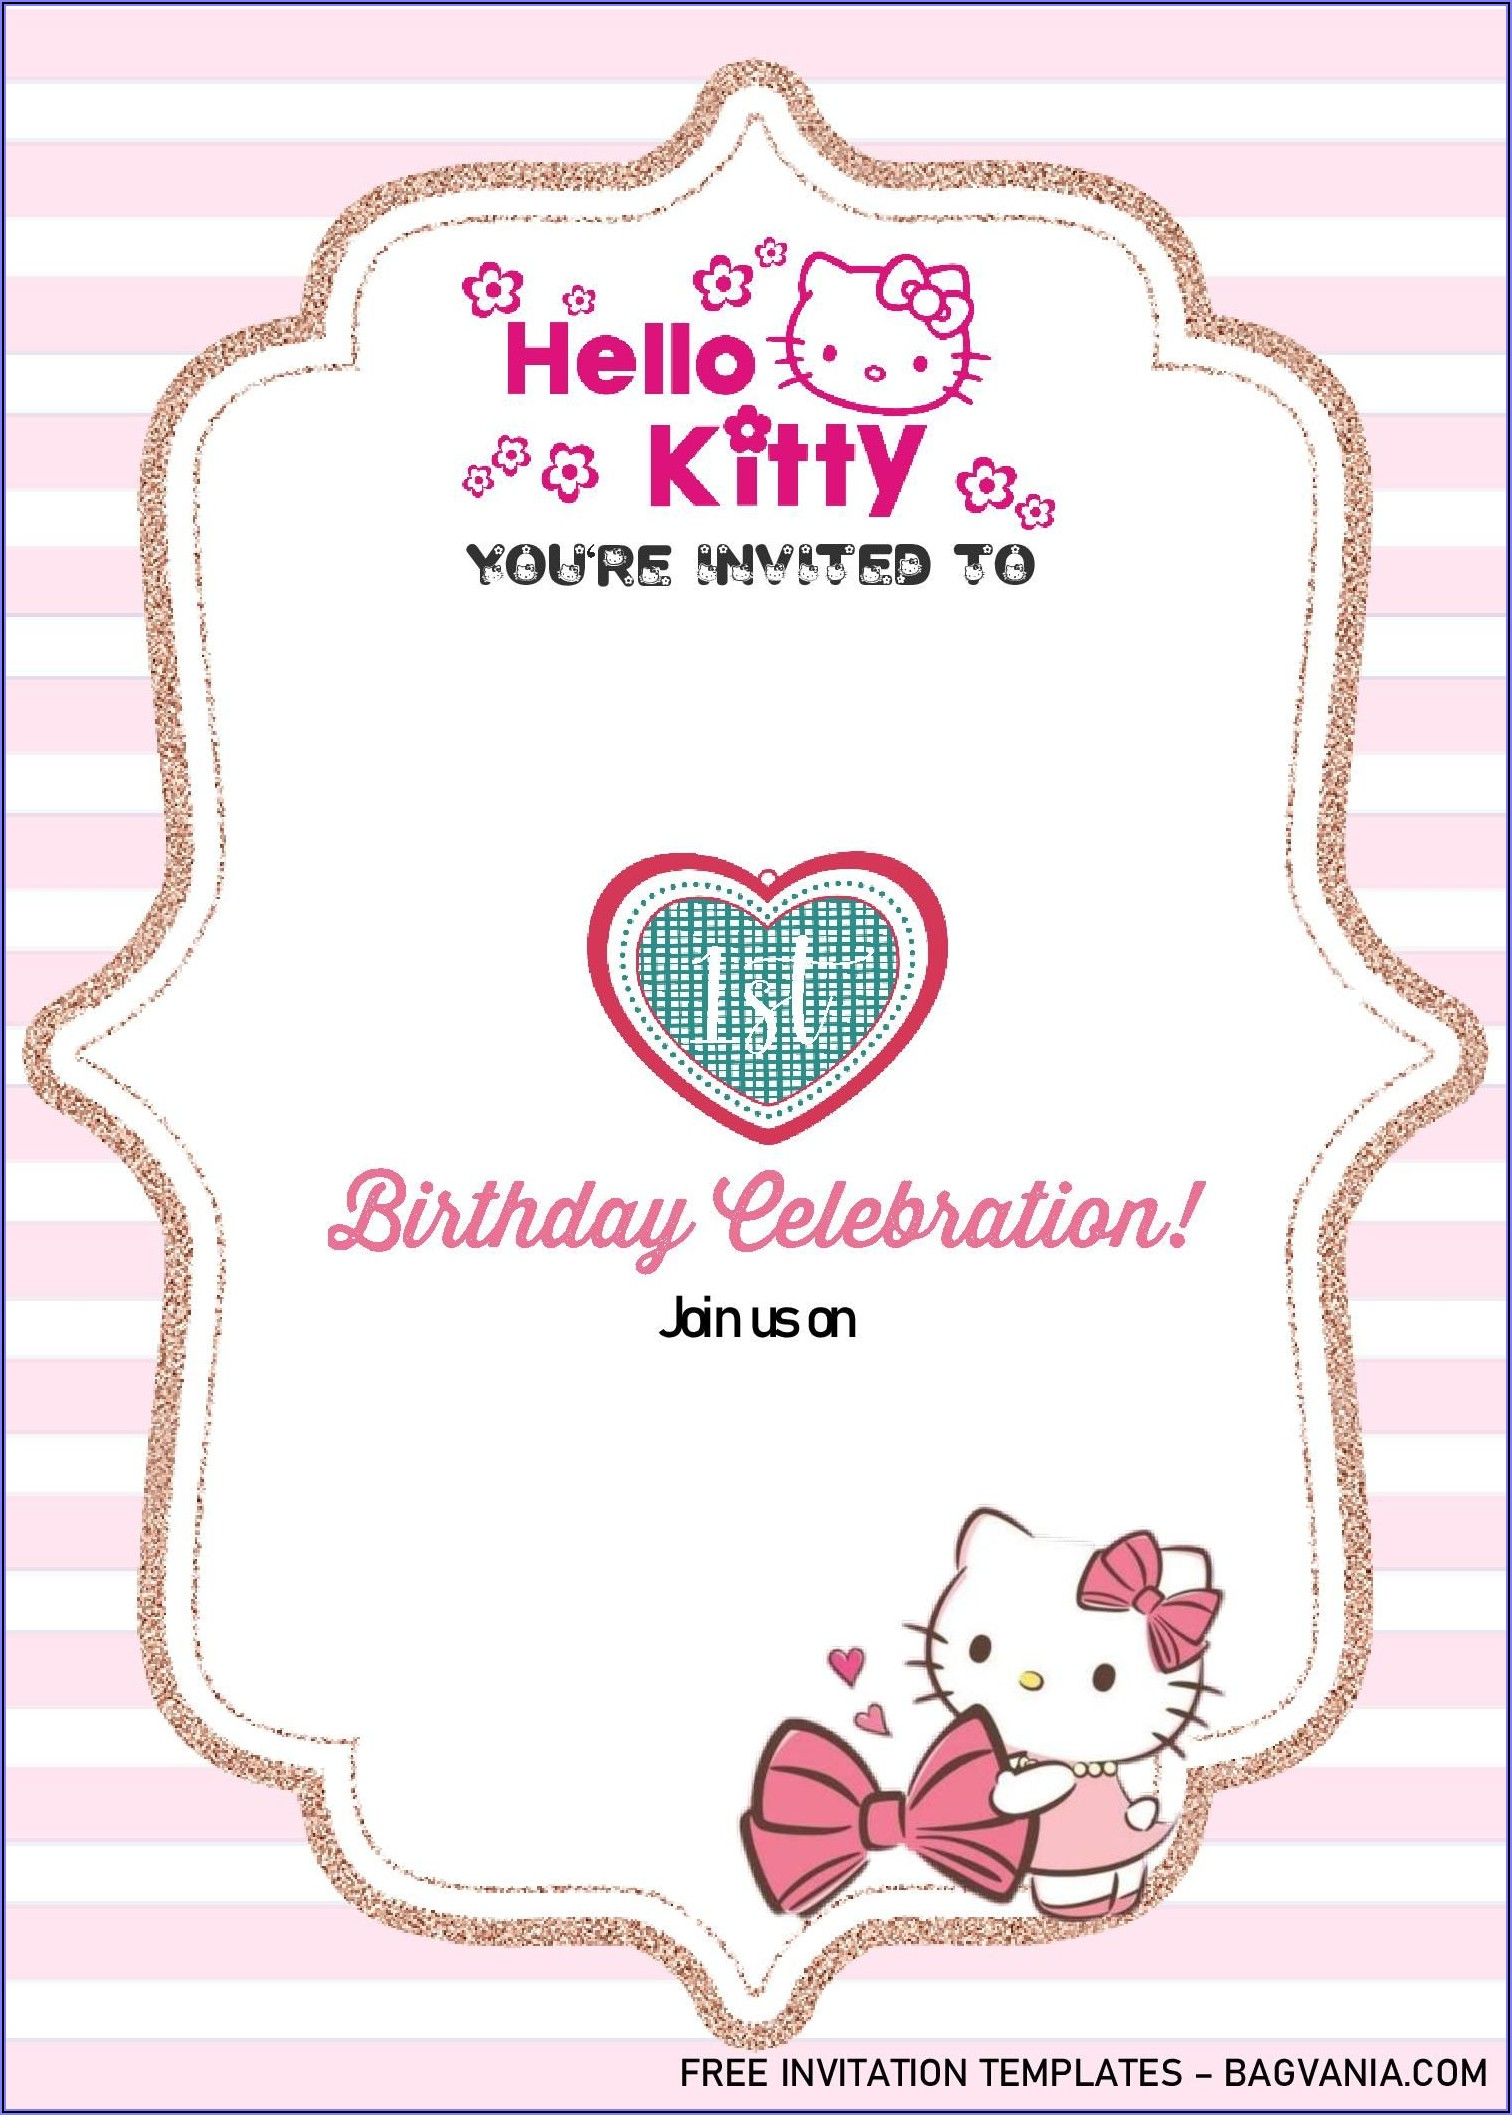 Hello Kitty Editable Invitation Templates